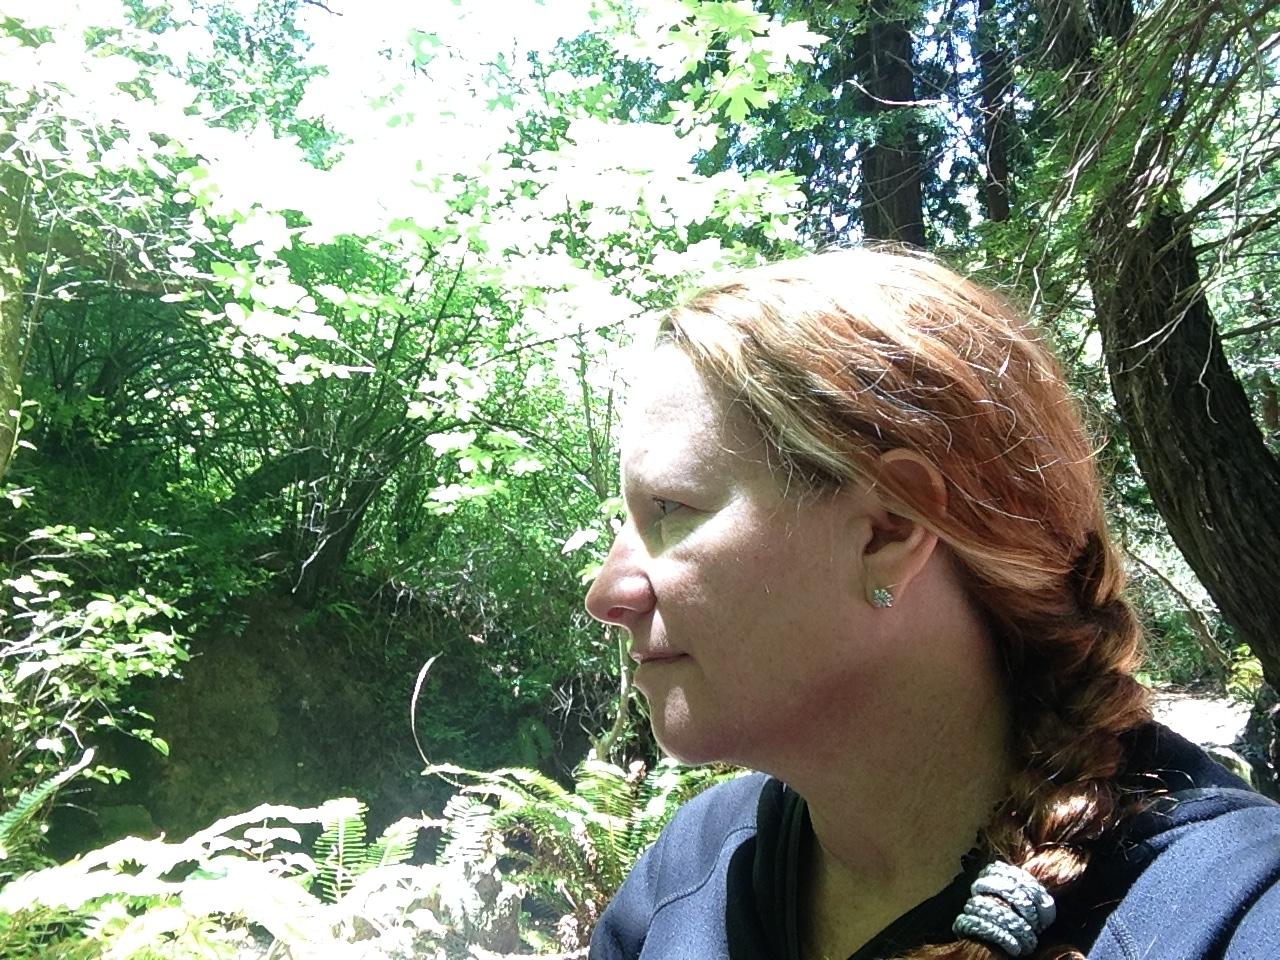 The author hiking at Purissma Creek.